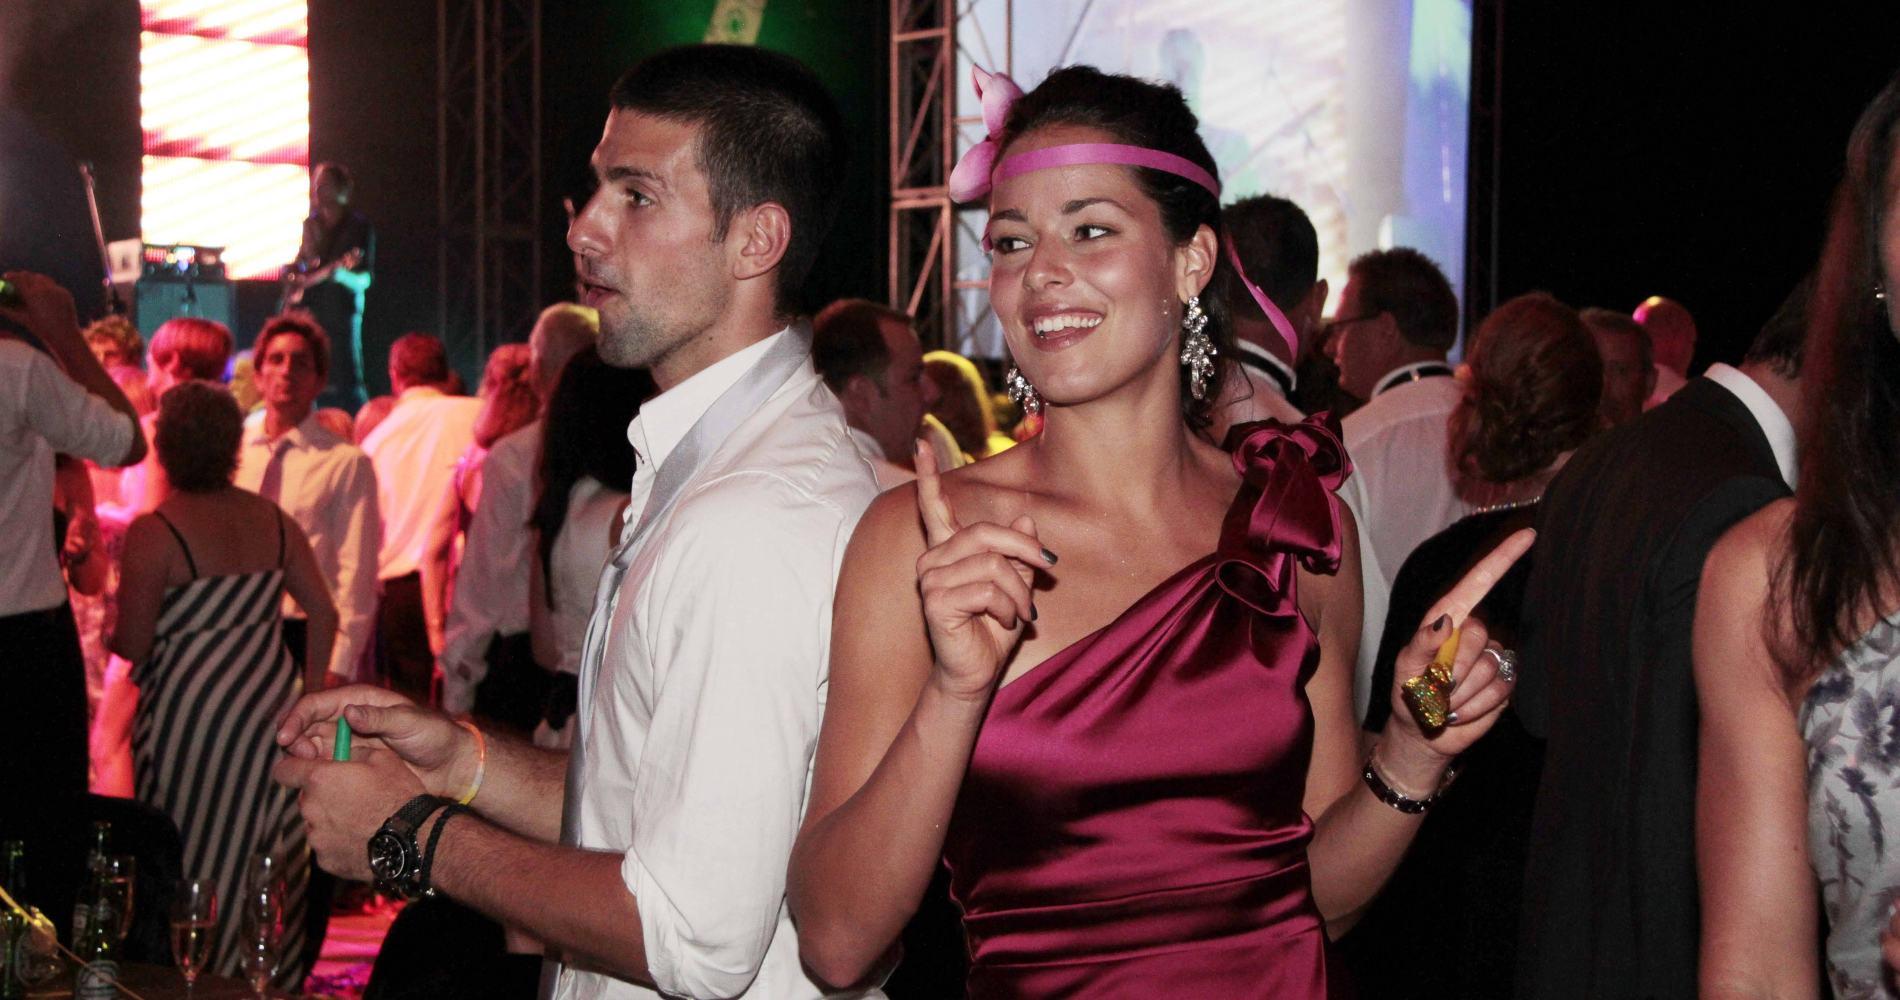 Novak Djokovic and Ana Ivanovic, Hopman Cup, 2011